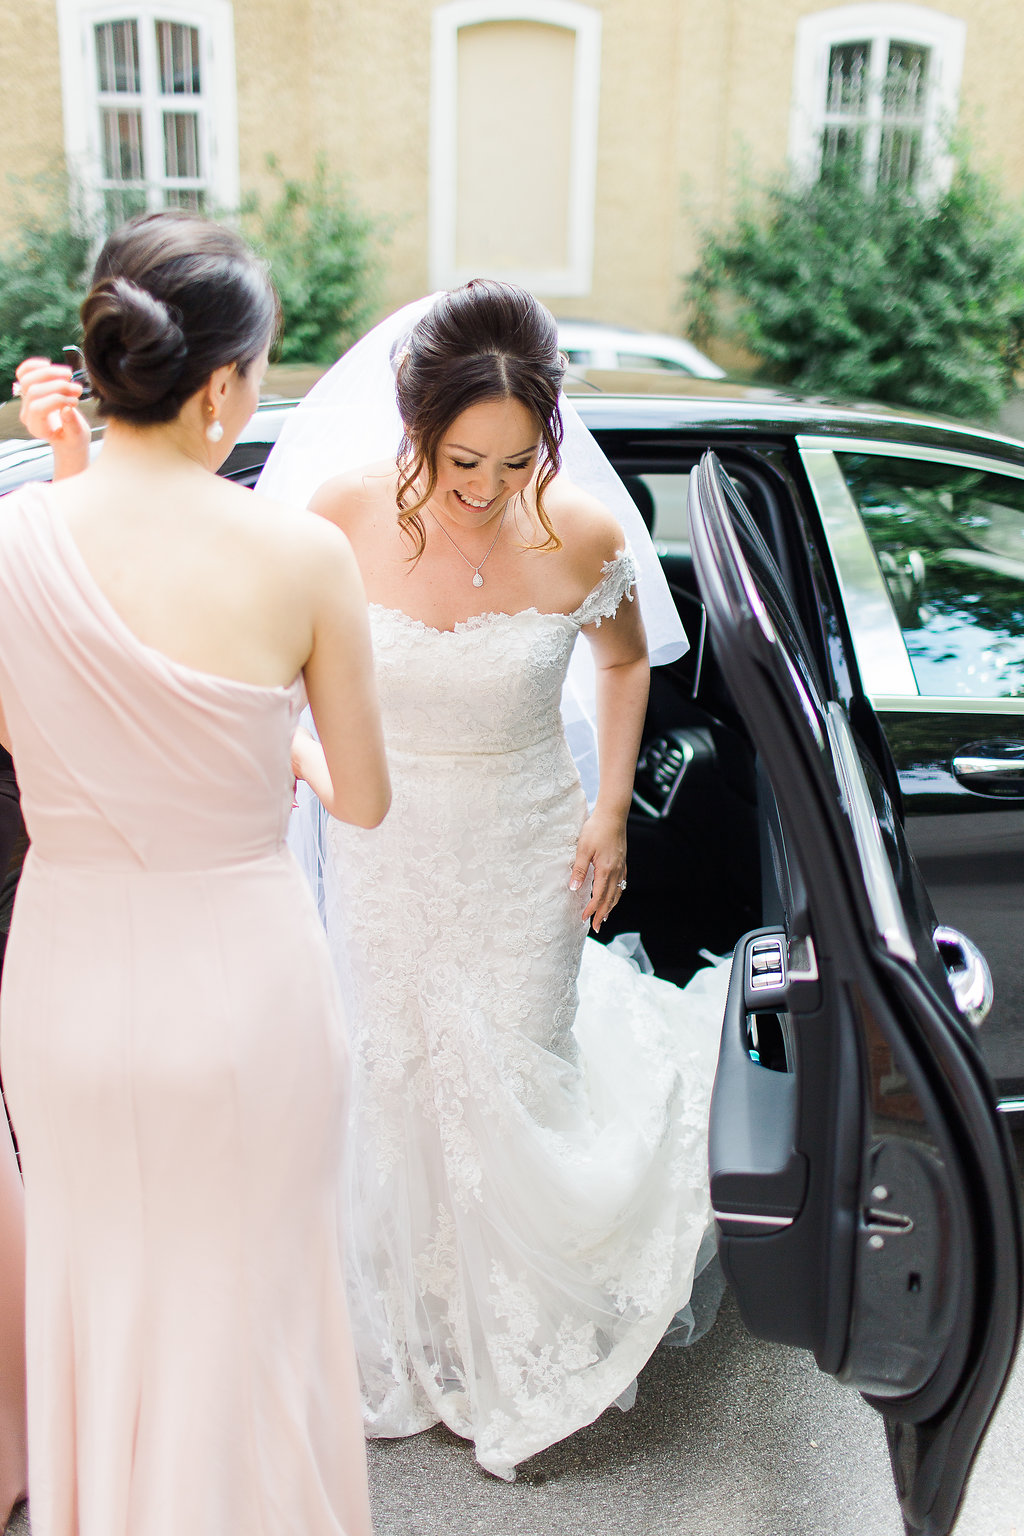 Luxe Navy and Pink Wedding at Schloss Fuschl in Austria by Tanja Kibogo32.JPG